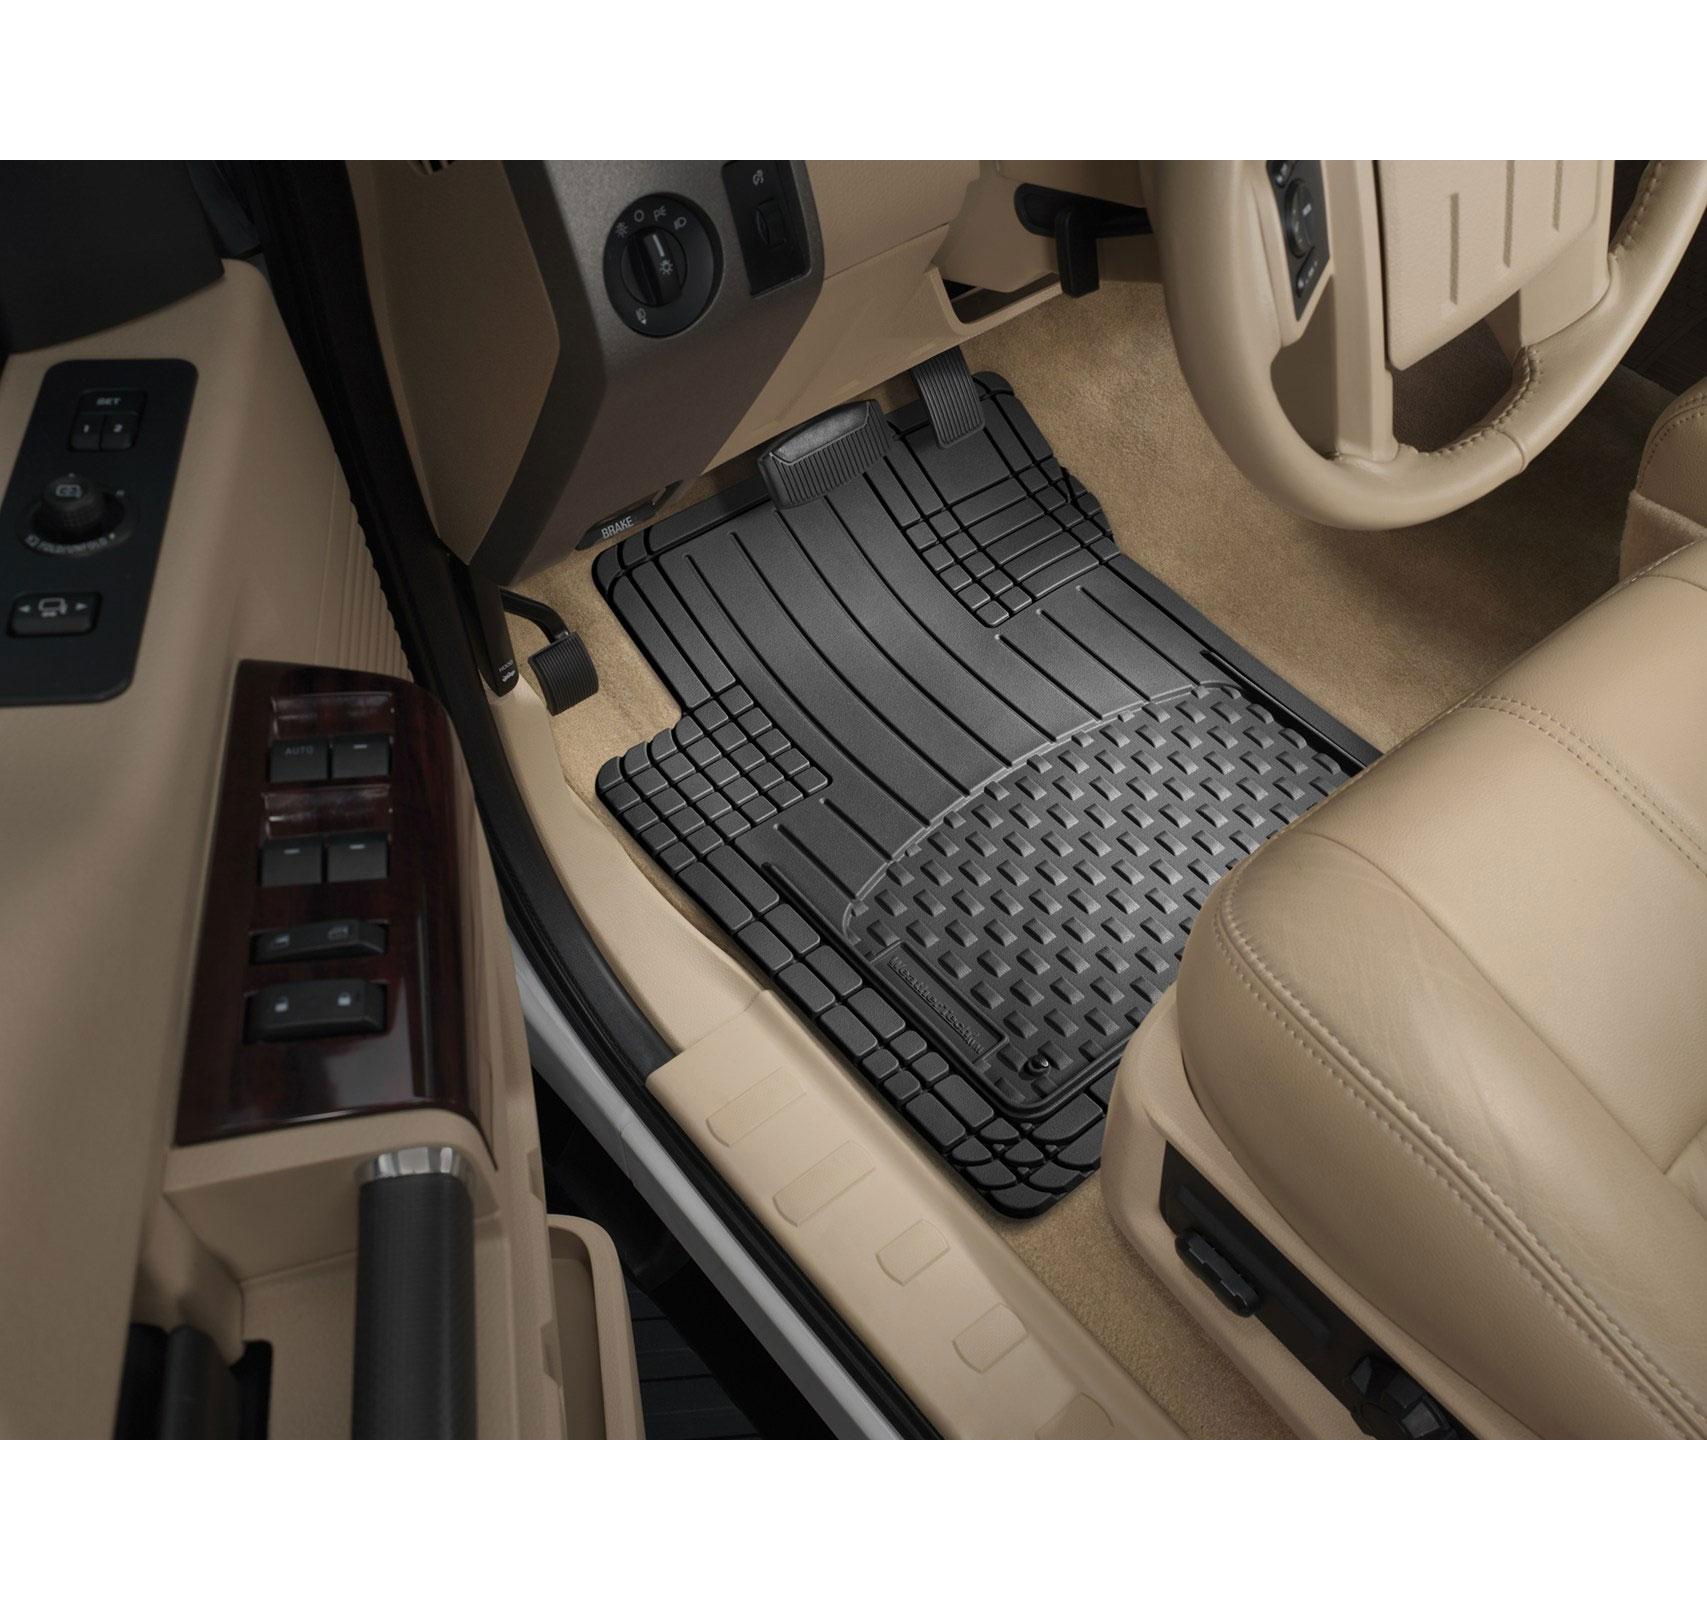 Weathertech avm semi universal trim to fit mats black 4 piece set